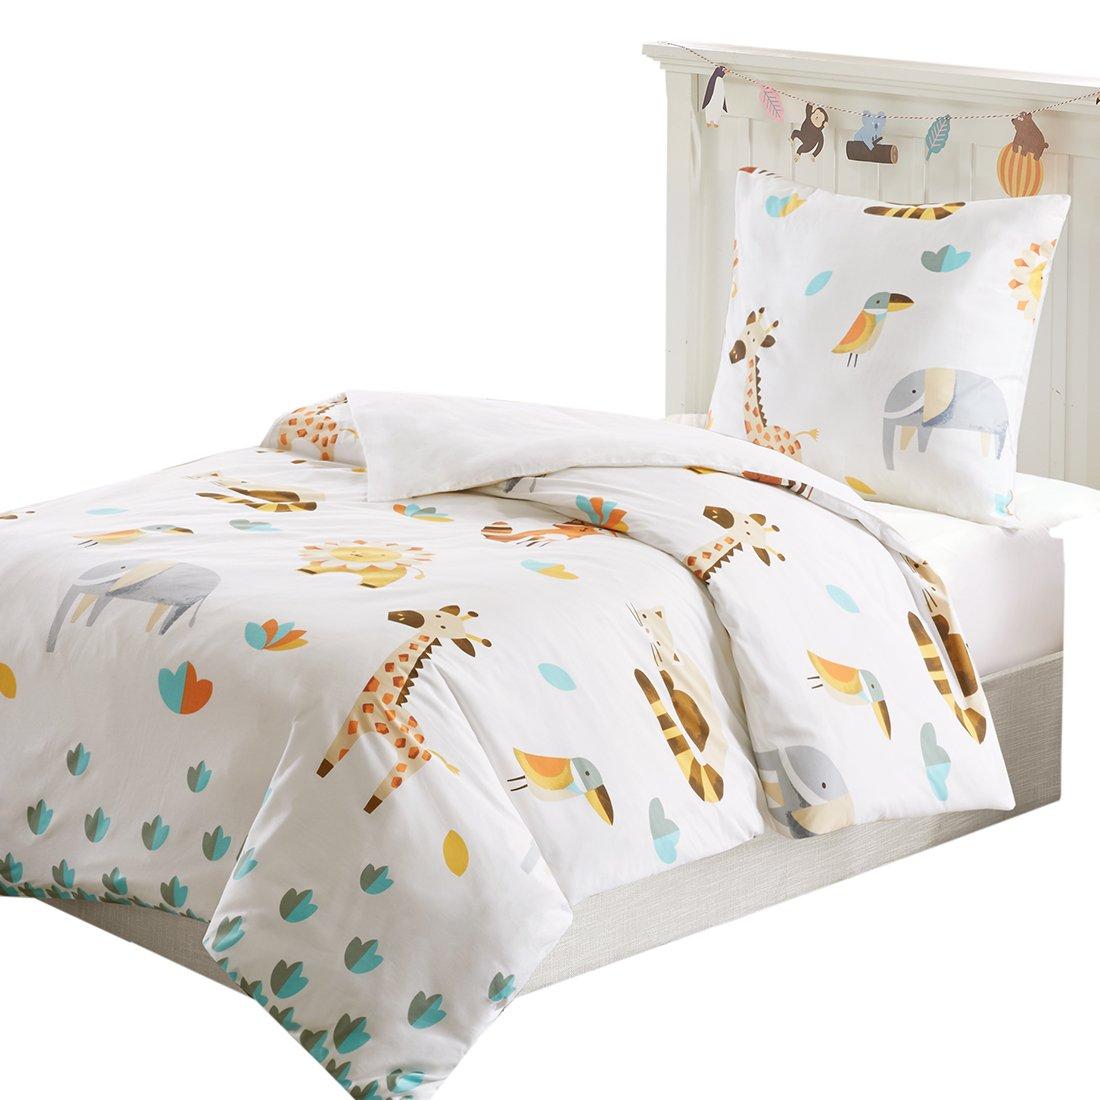 135x200cm+50x75cm, Multi Childrens Animal Zoo Luxury Percale Lovely kindergarten Printing Single Duvet Cover Pillowcase Bedding Sets